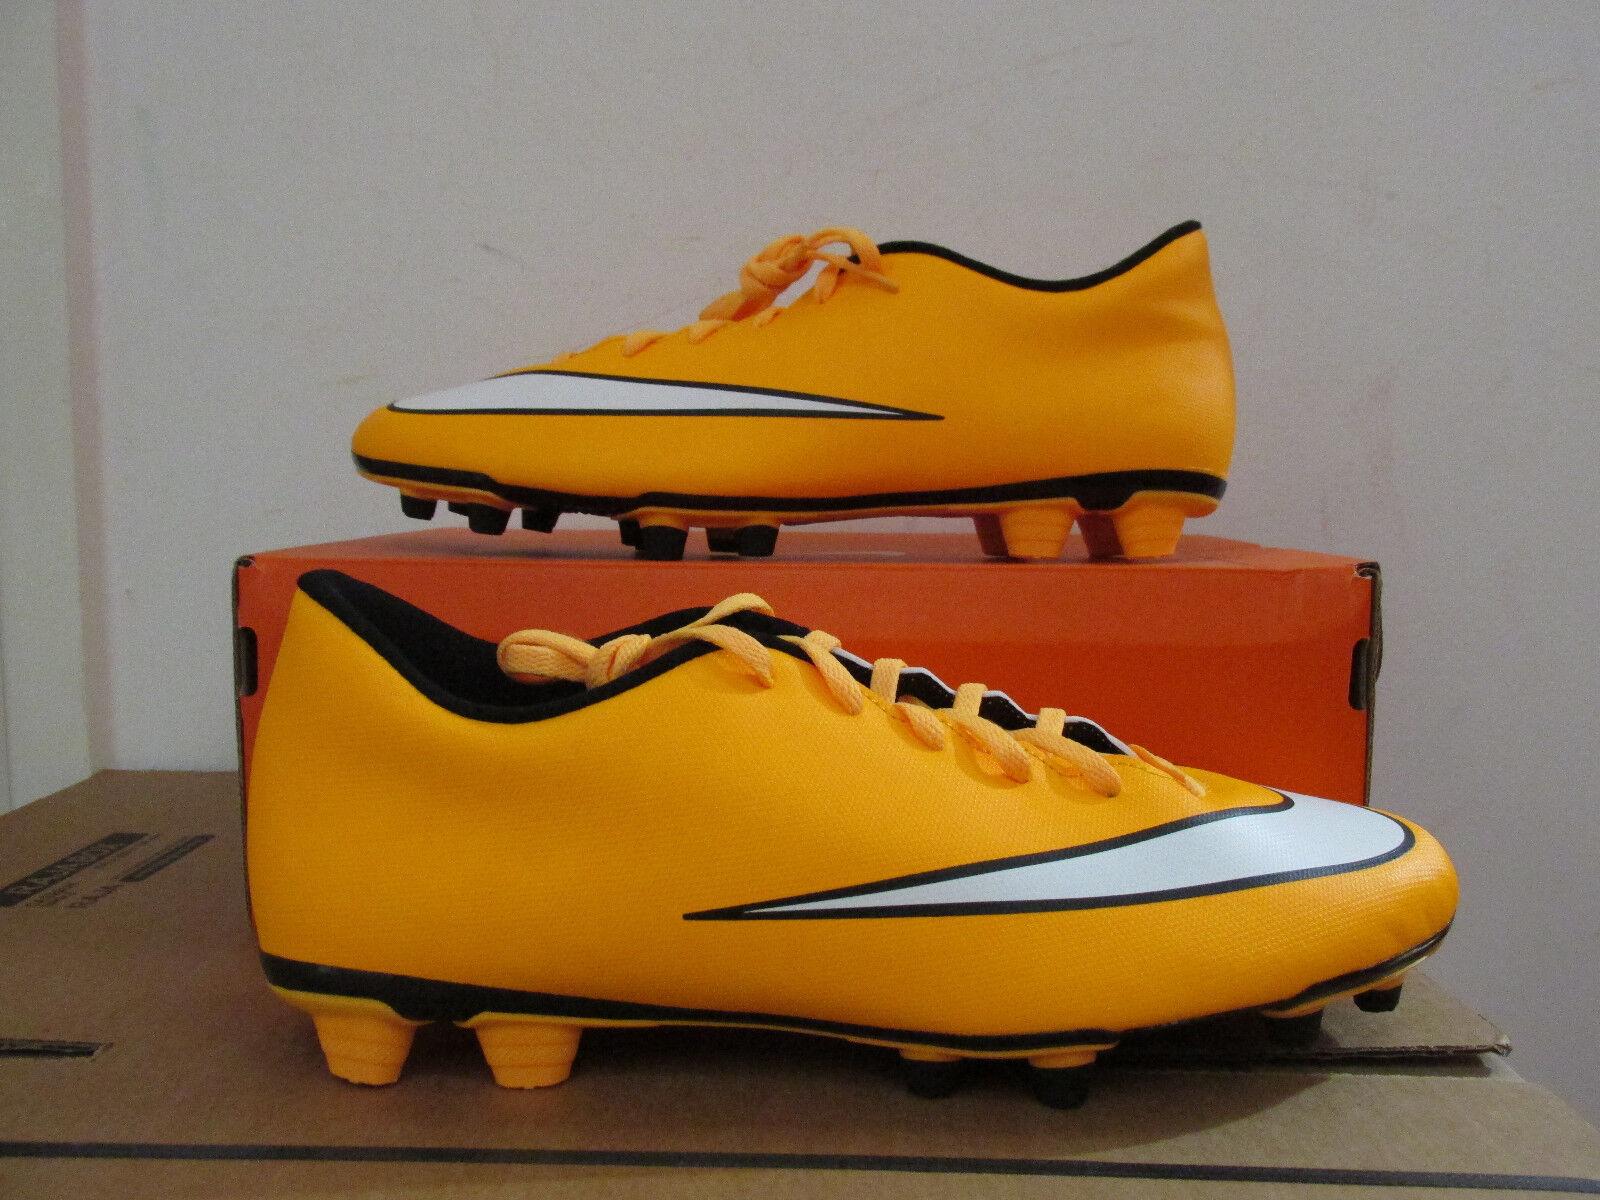 Nike Mercurial Vortex Fg Calcio Stivali 651647 800 Calcio Salda Svendita Seasonal price cuts, discount benefits